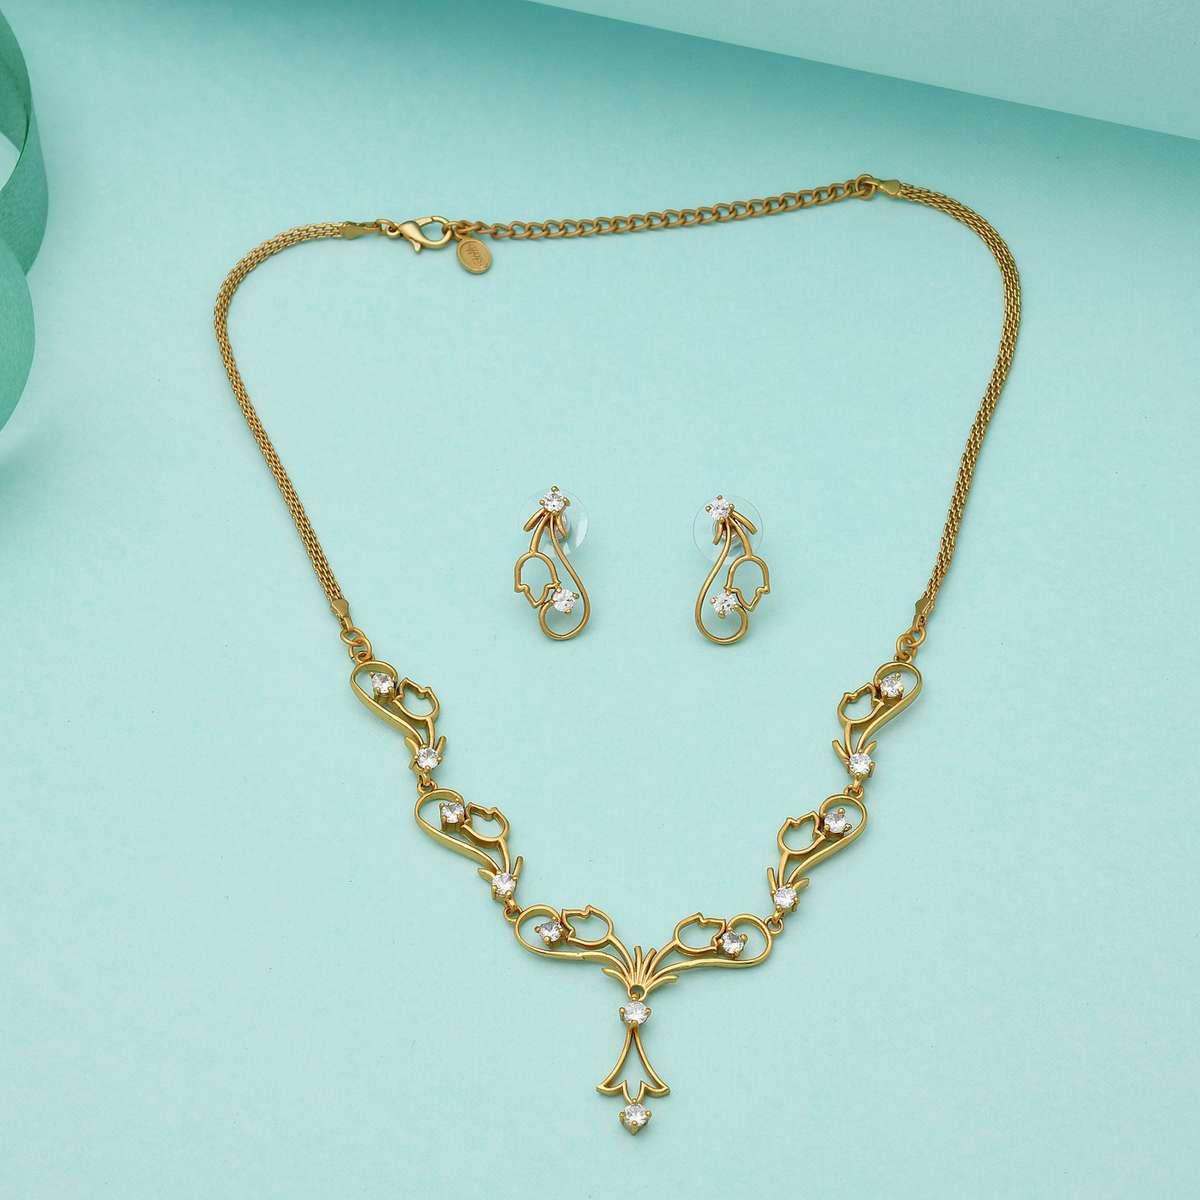 2.ESTELE Embellished Necklace and Earrings Set